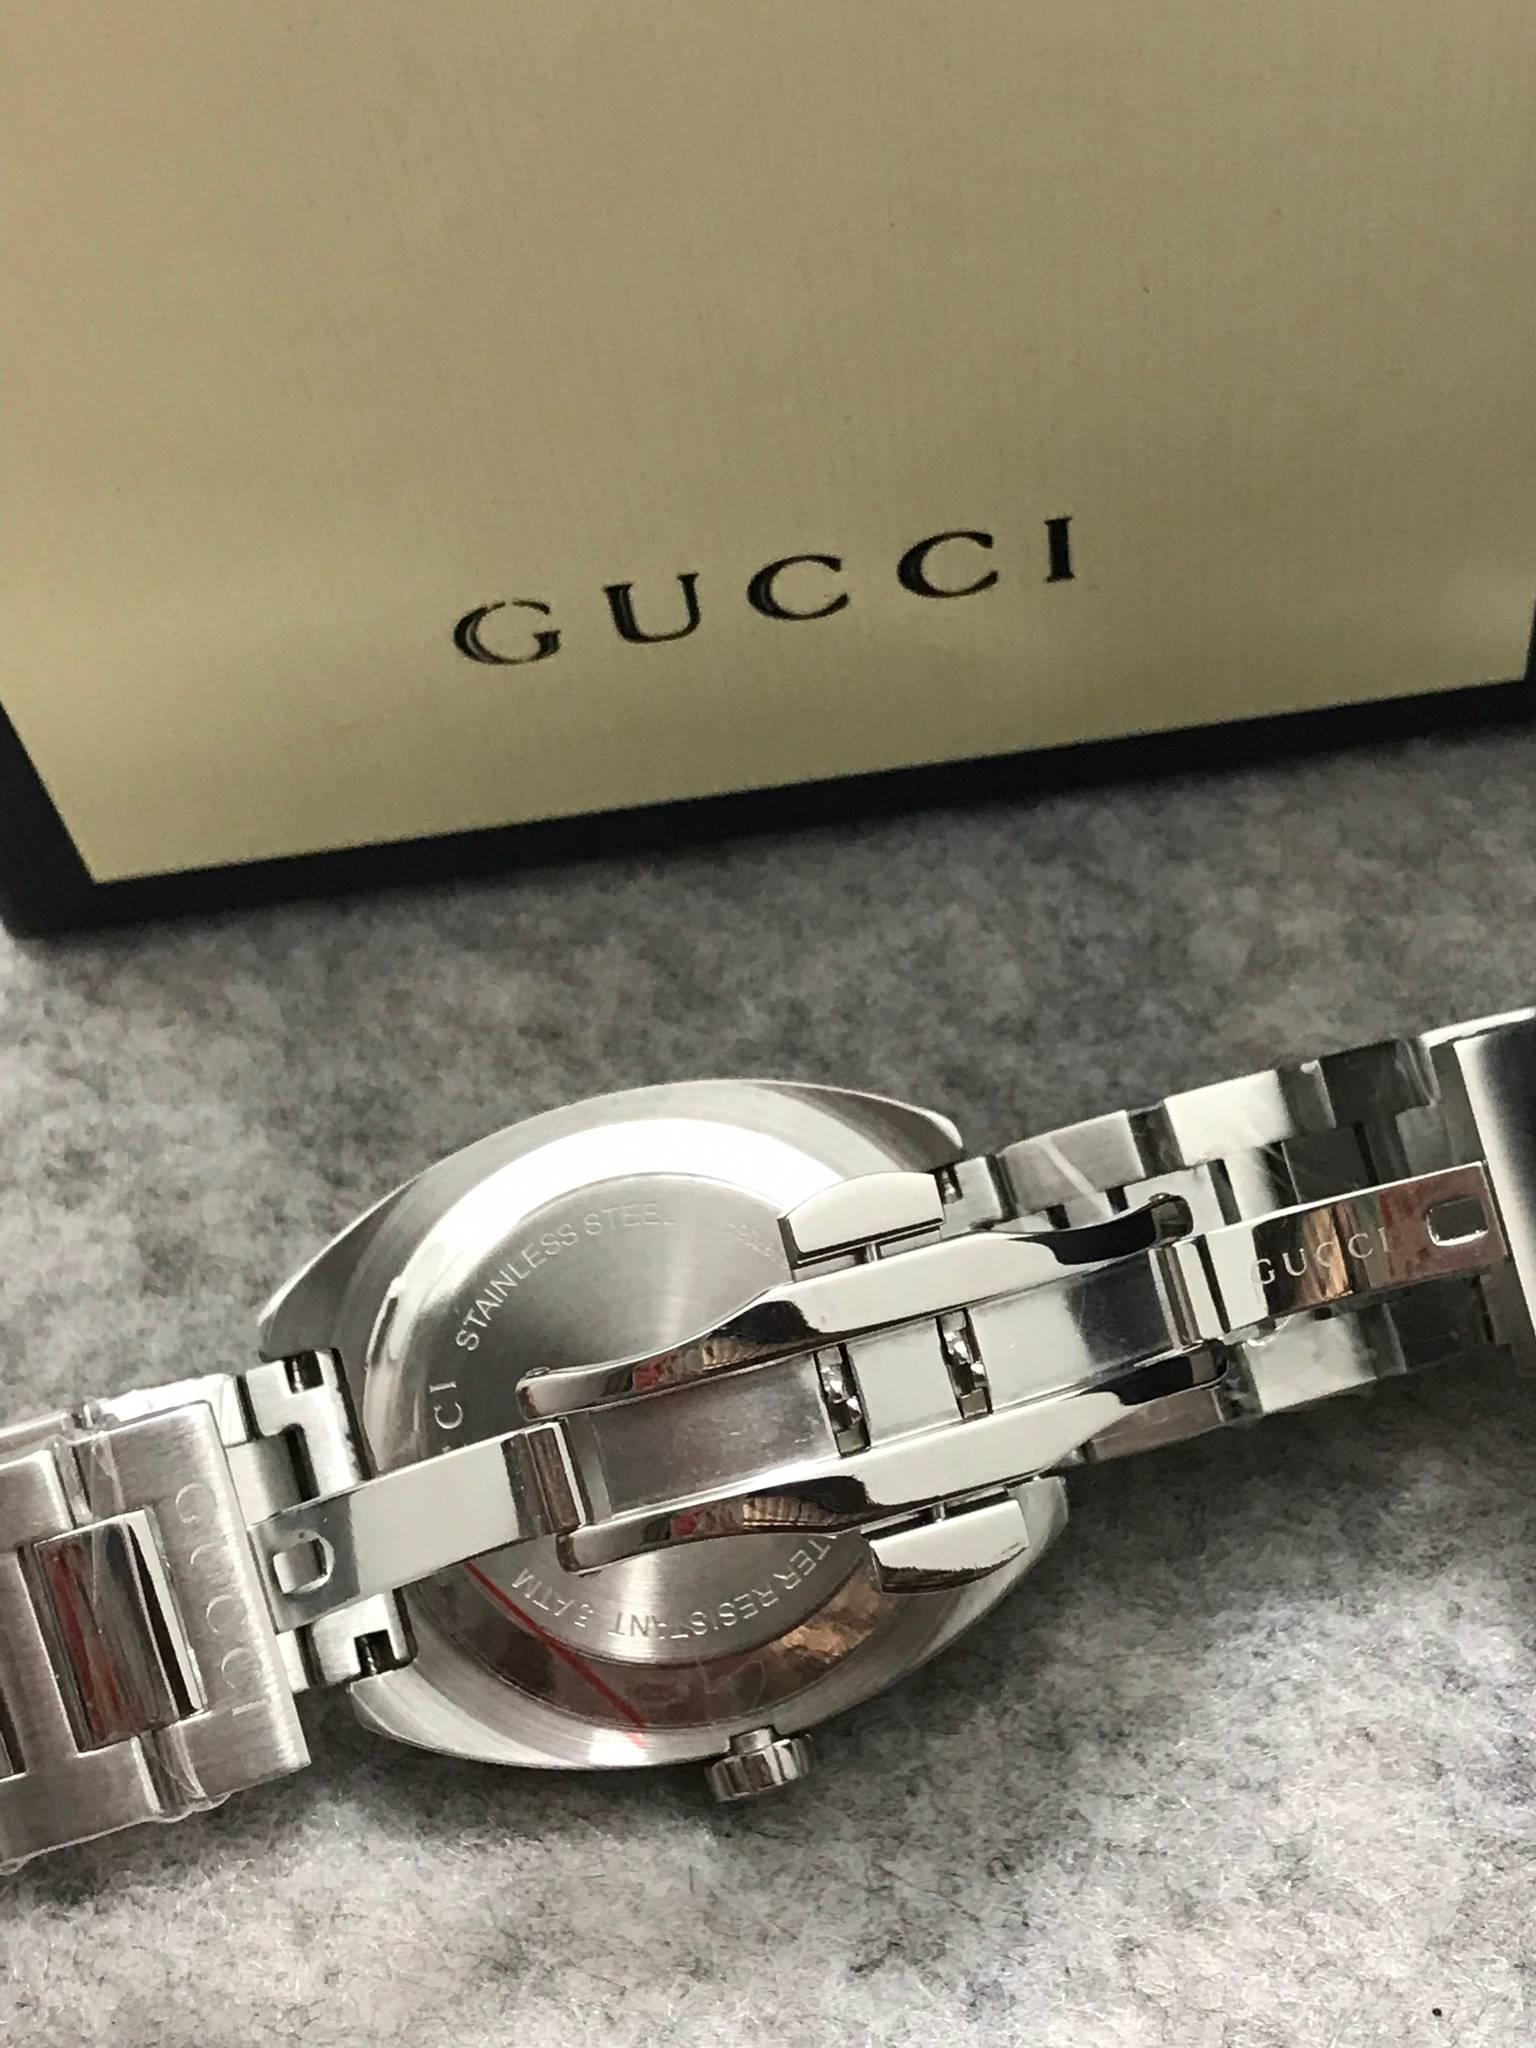 Gucci 100meter men's Watch White Dial GG2570 ก๊อปสายเลส หน้าปัดขาว